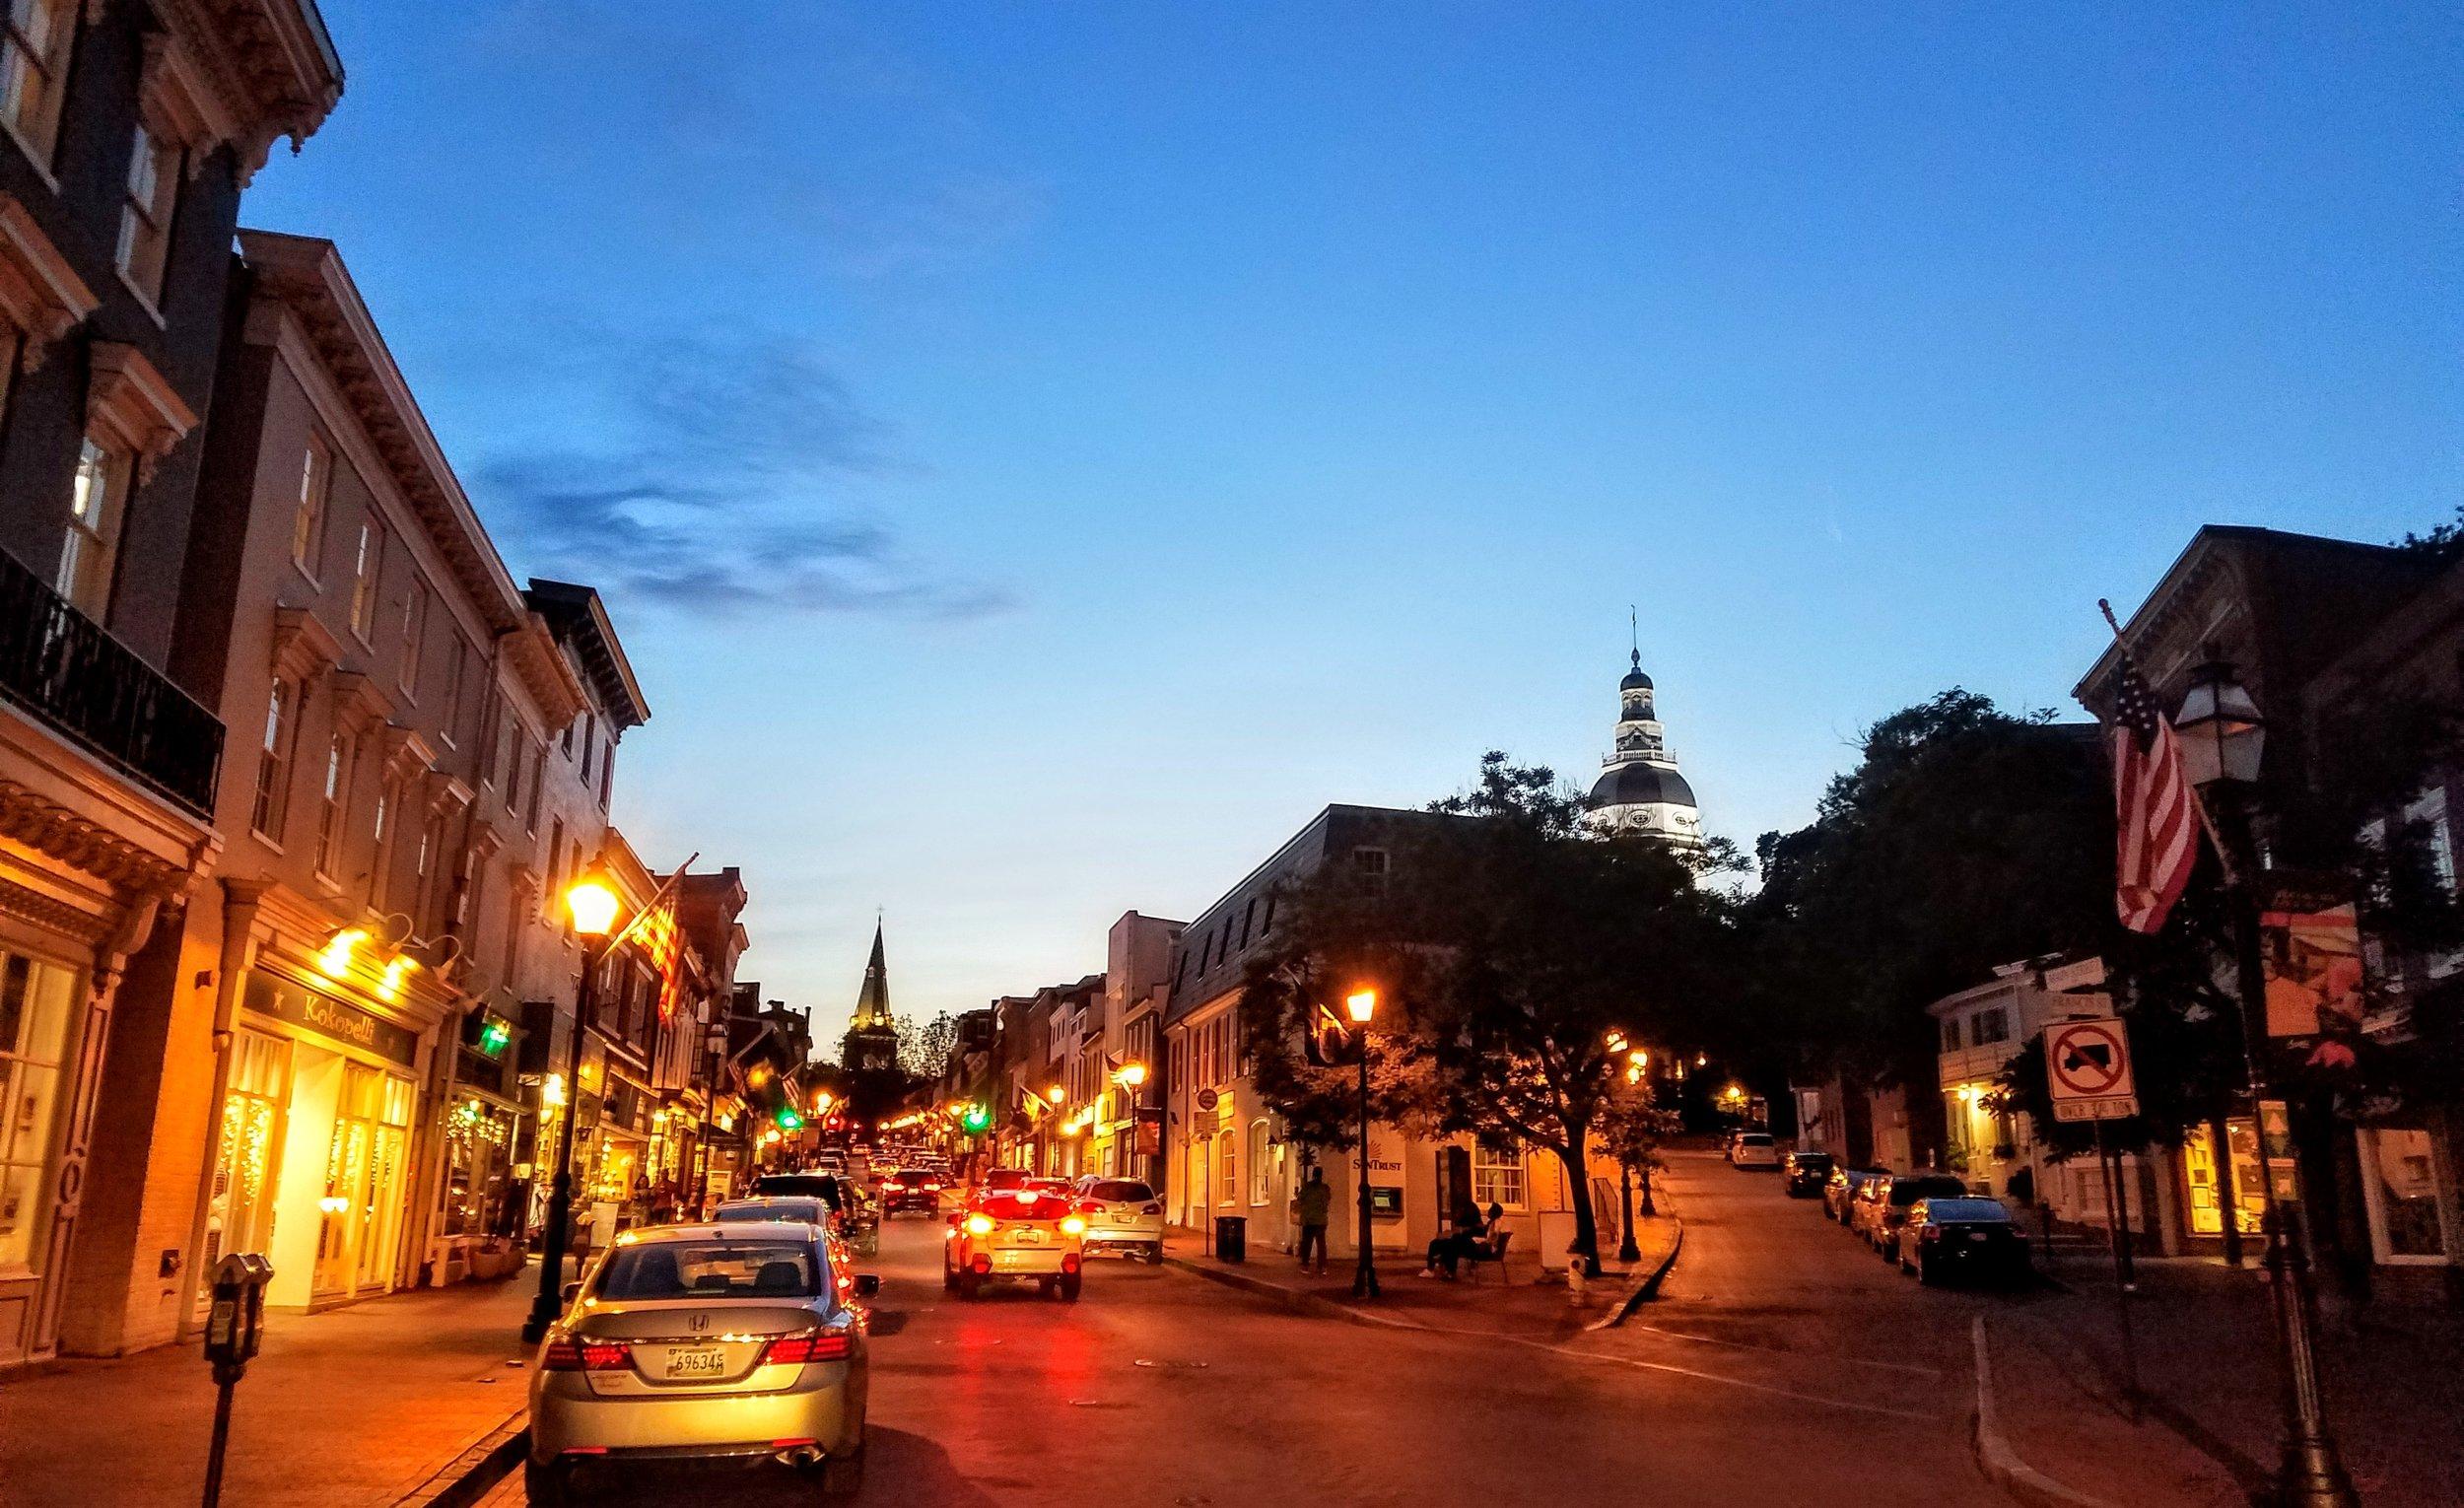 Twilight on Main Street, Annapolis, MD